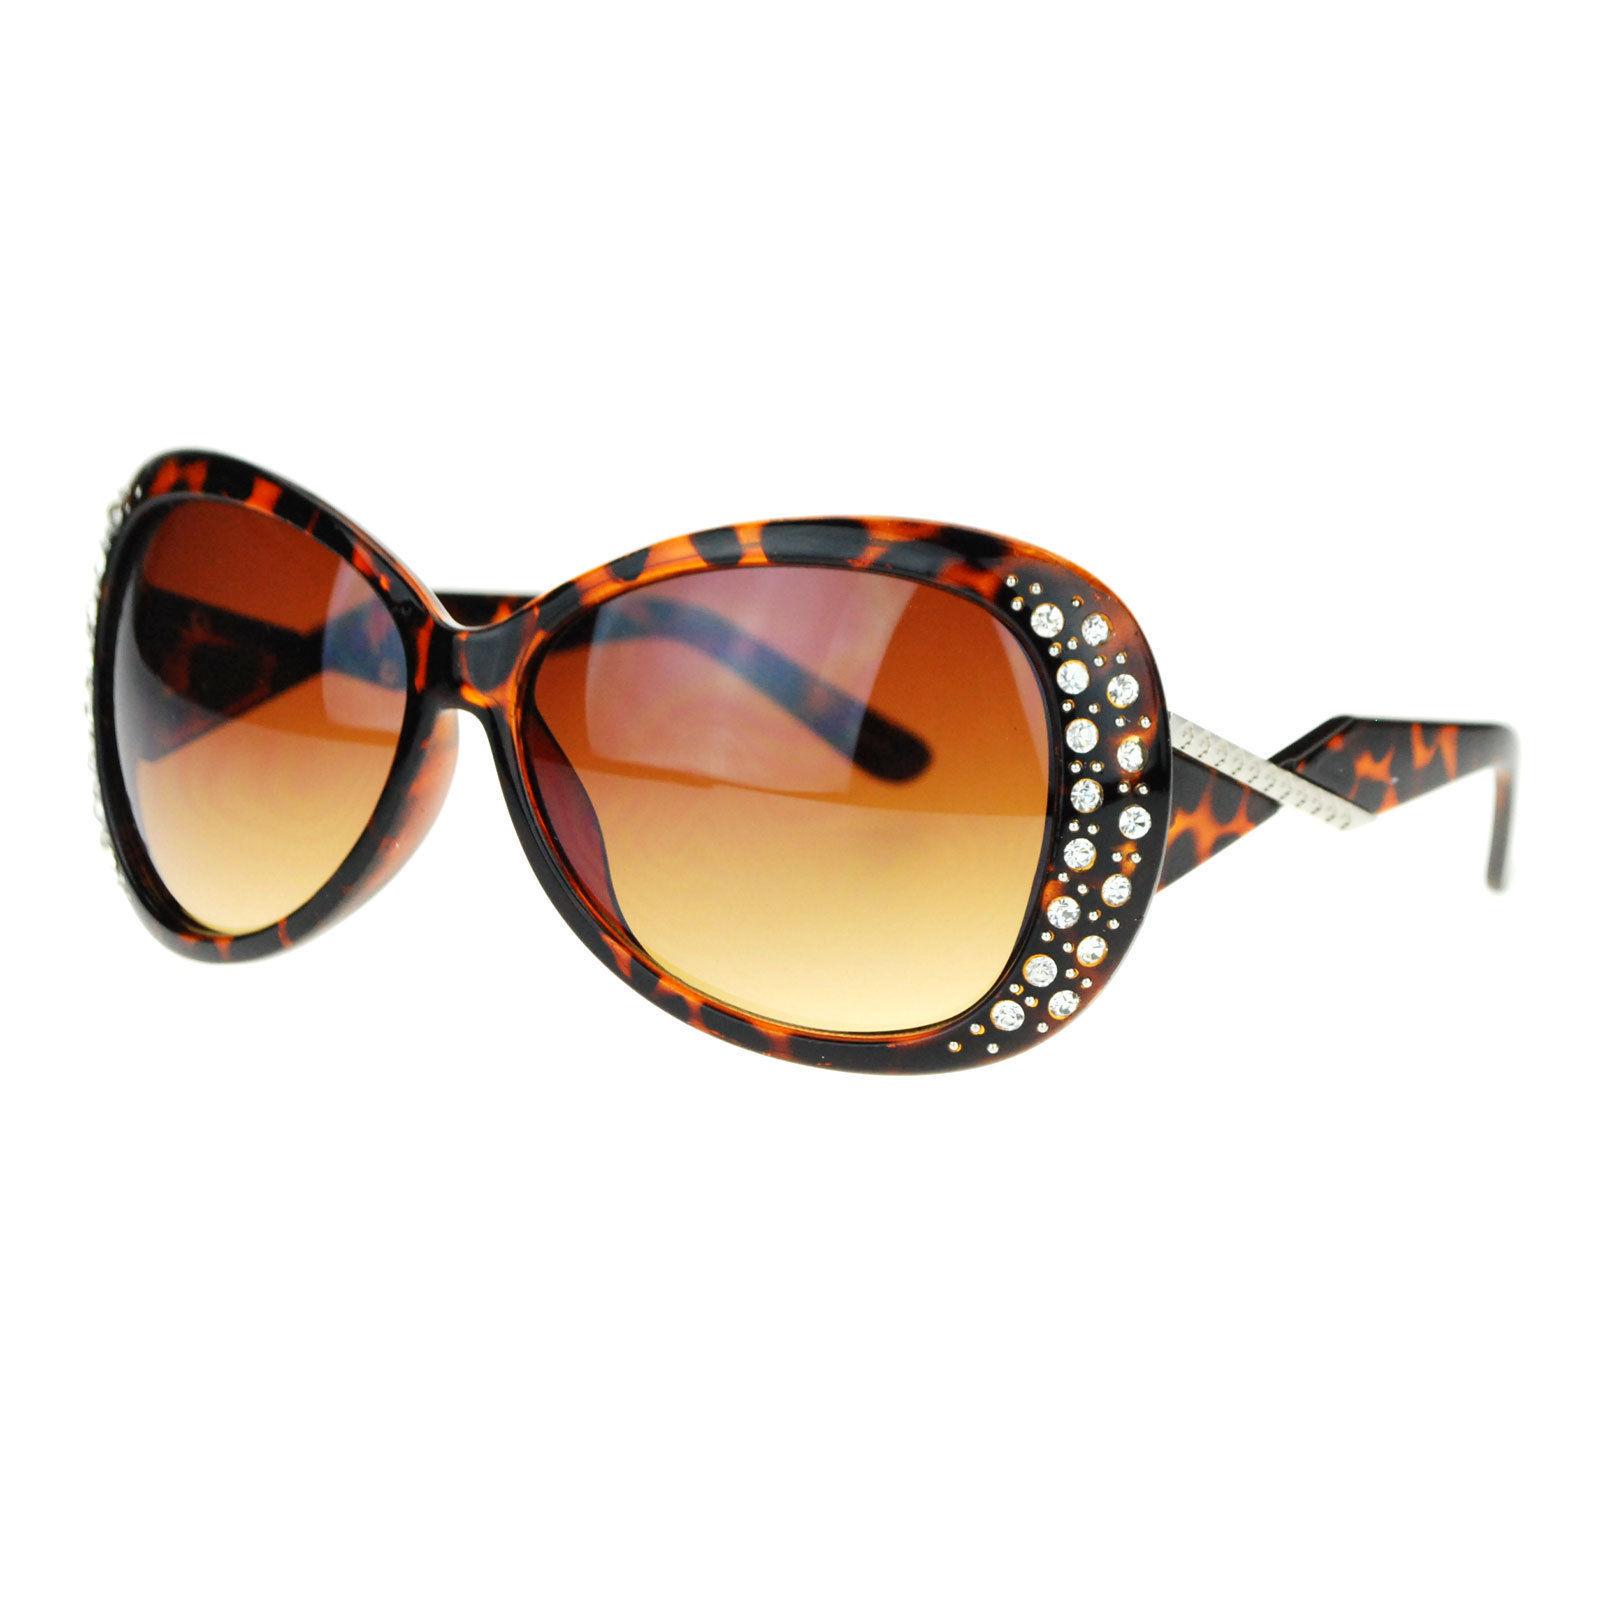 Womens Rhinestone Sunglasses Oversized Round Butterfly Designer Frame